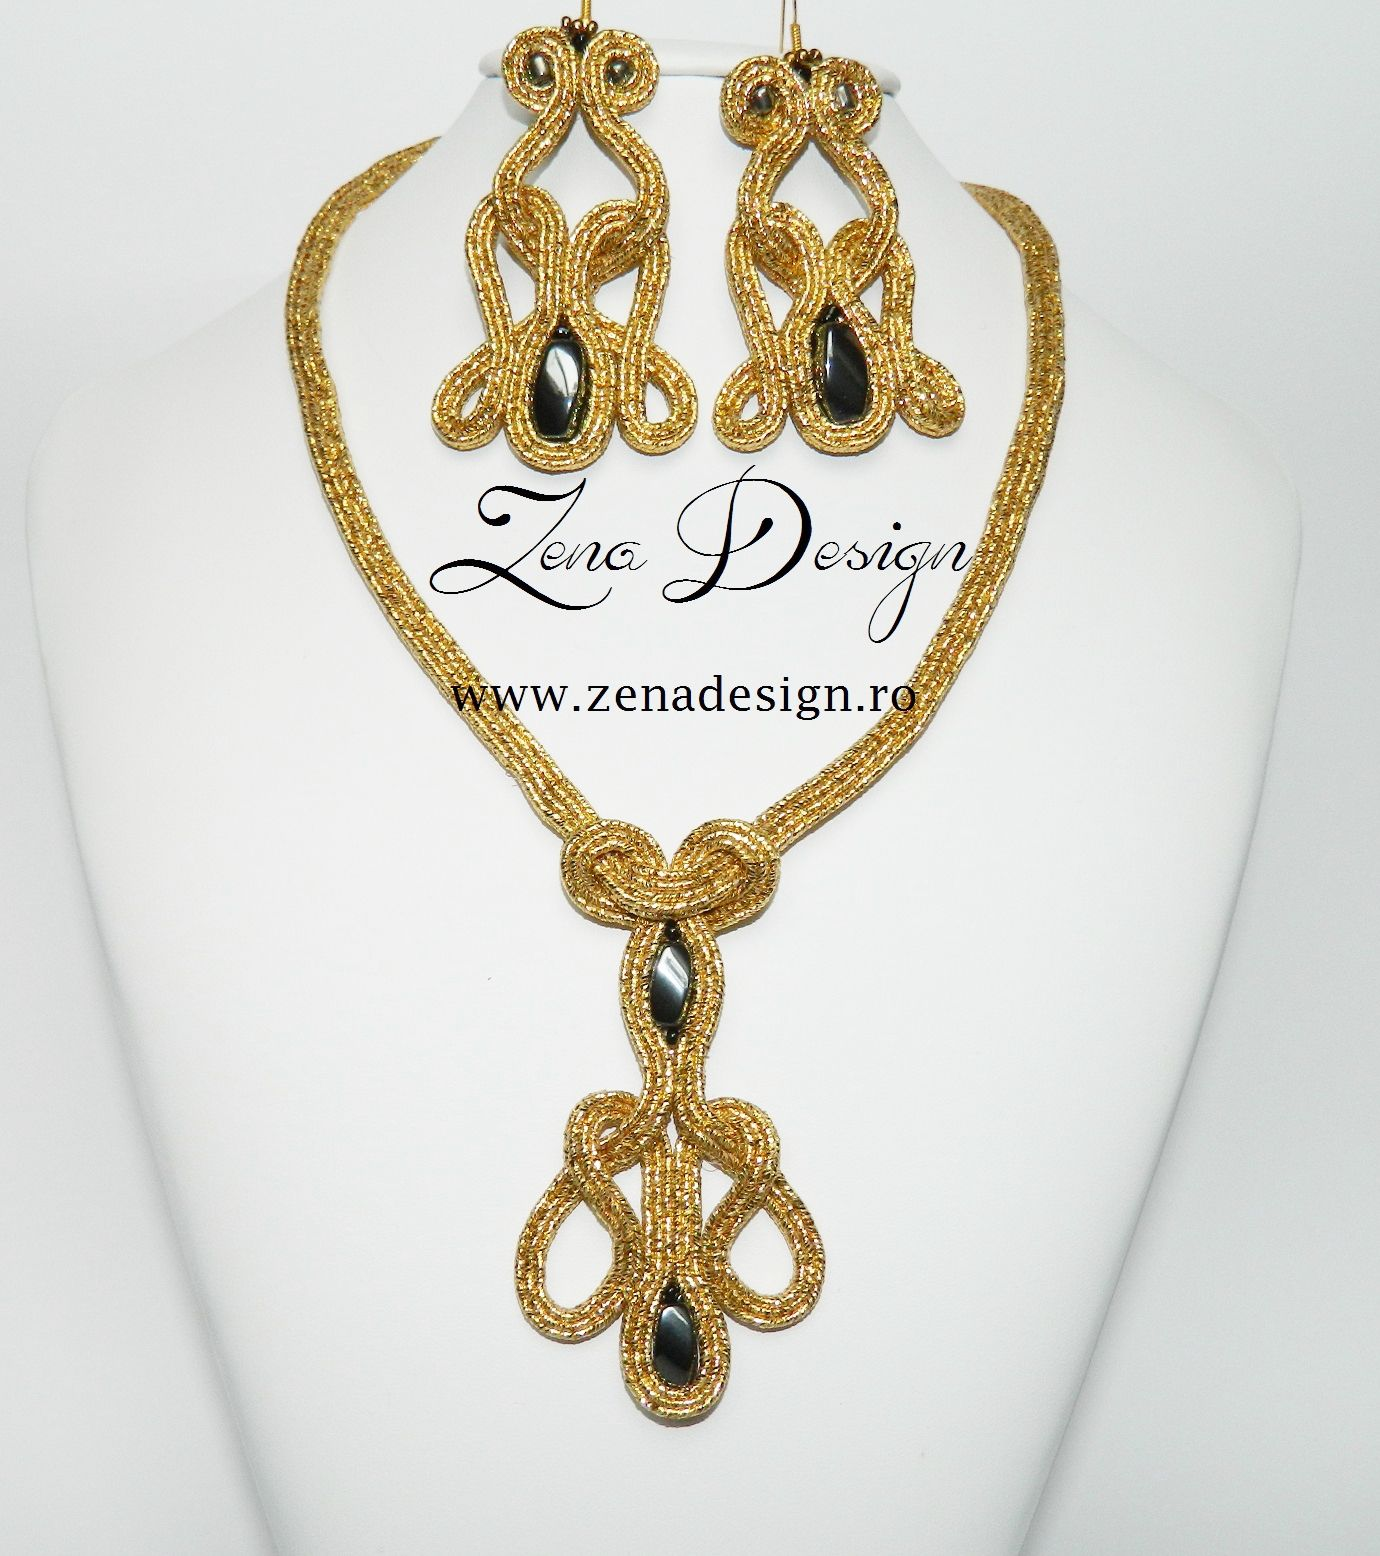 Zena Design - Soutache handmade jewelry!  Www.zenadesign.ro